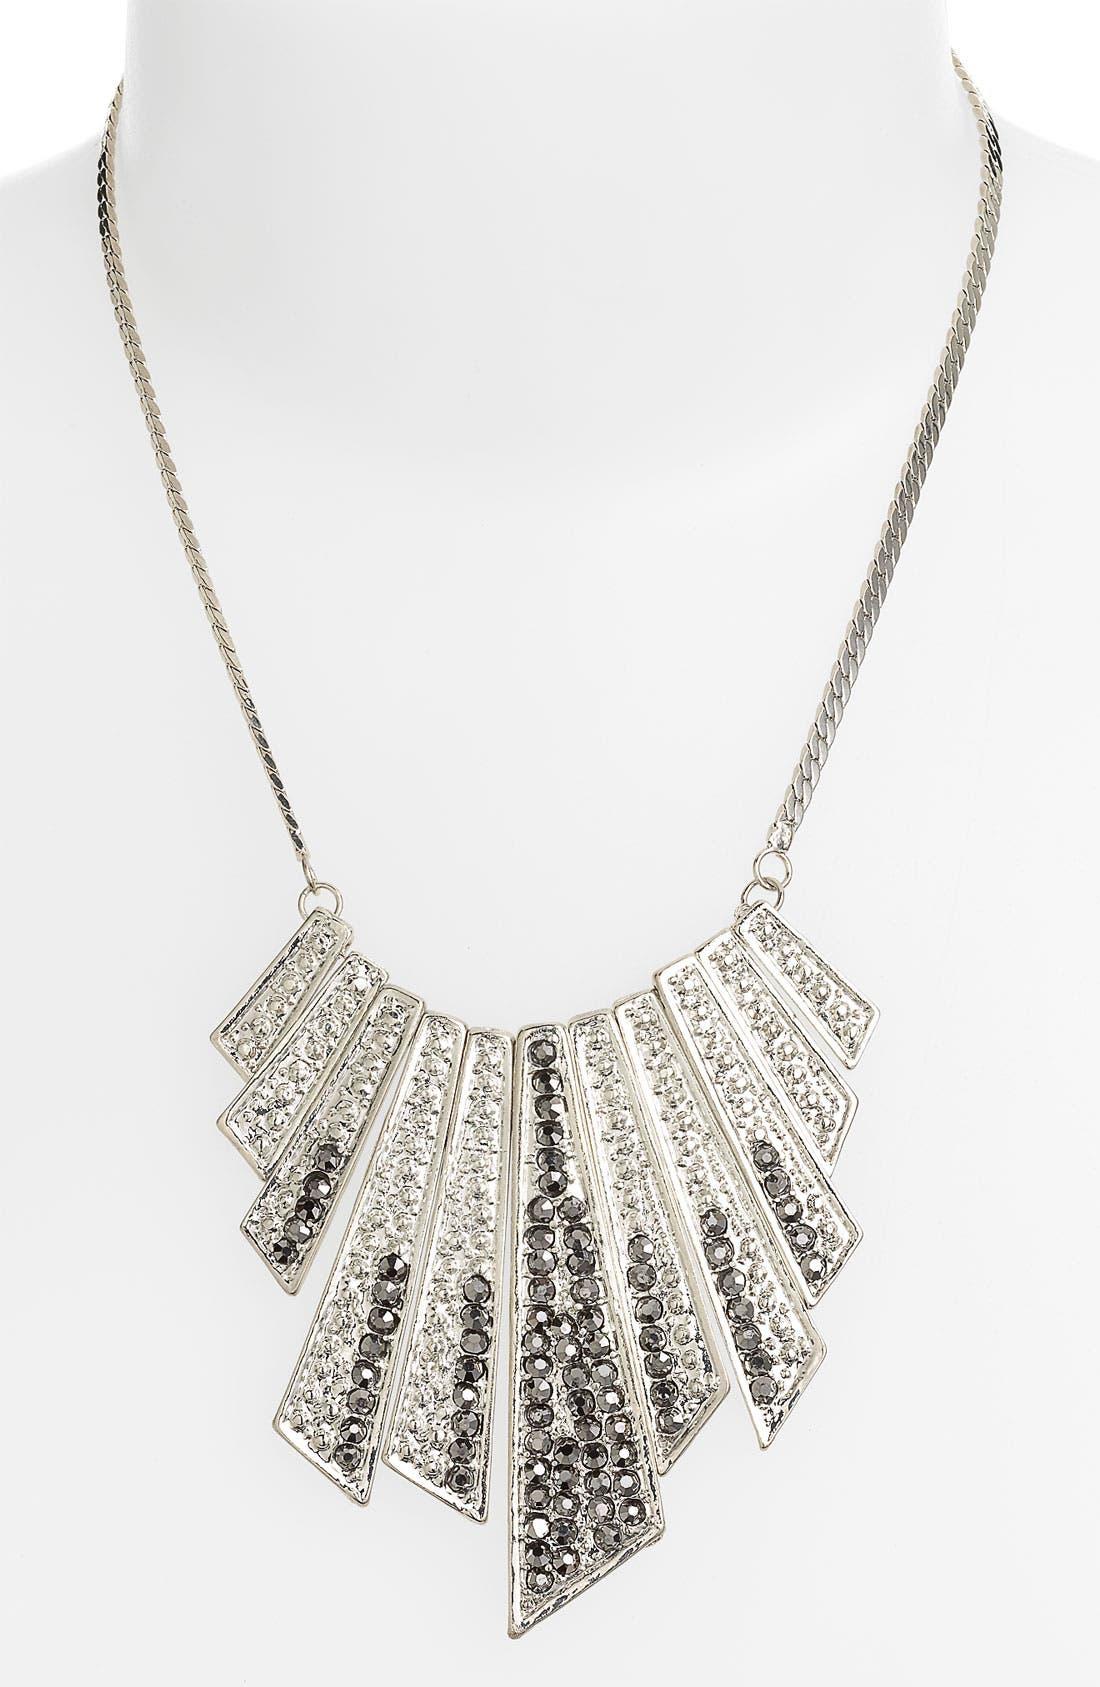 Main Image - BP. 'Rhinestone Shard' Bib Necklace